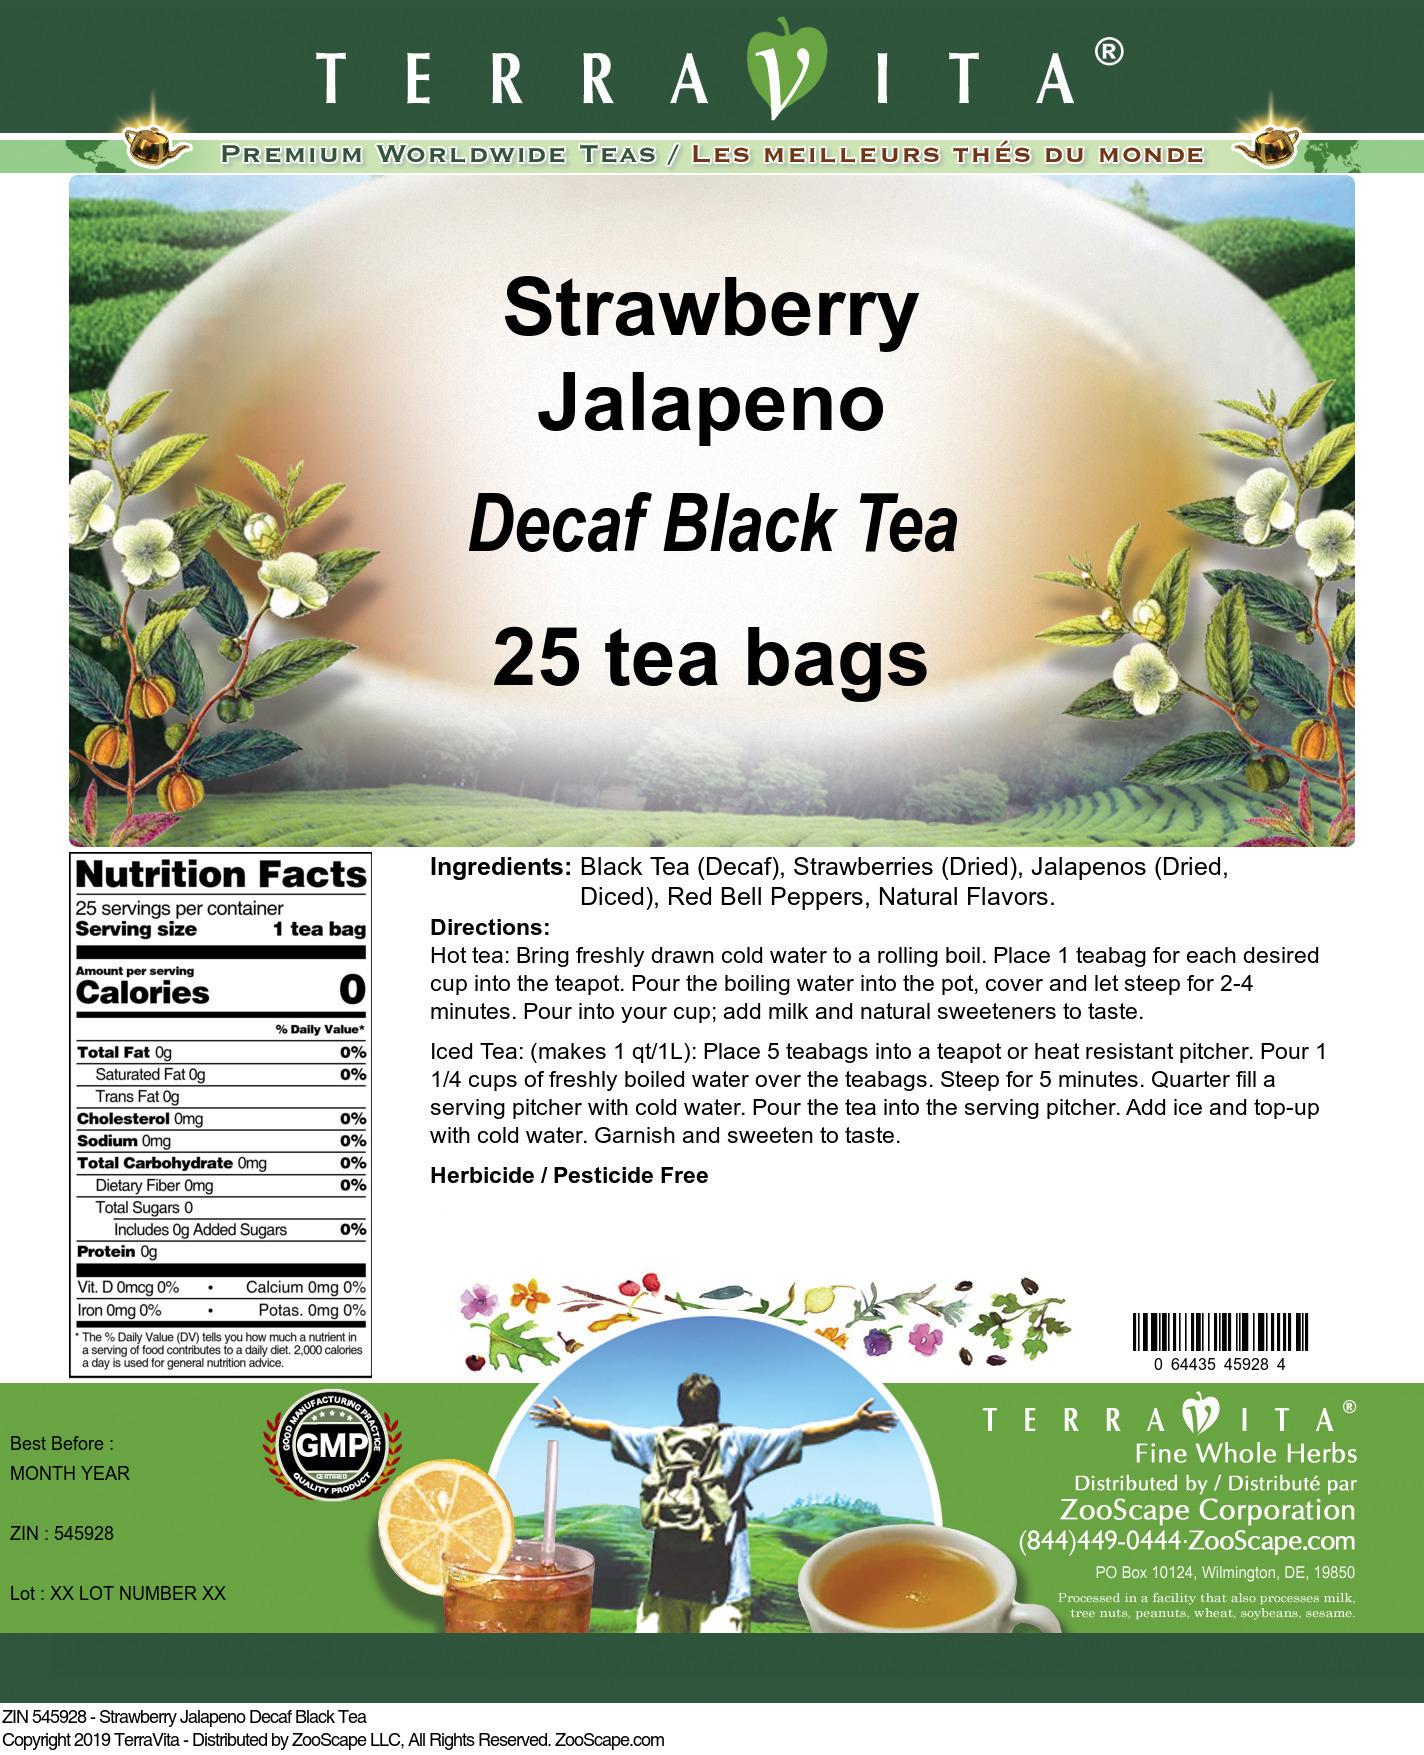 Strawberry Jalapeno Decaf Black Tea